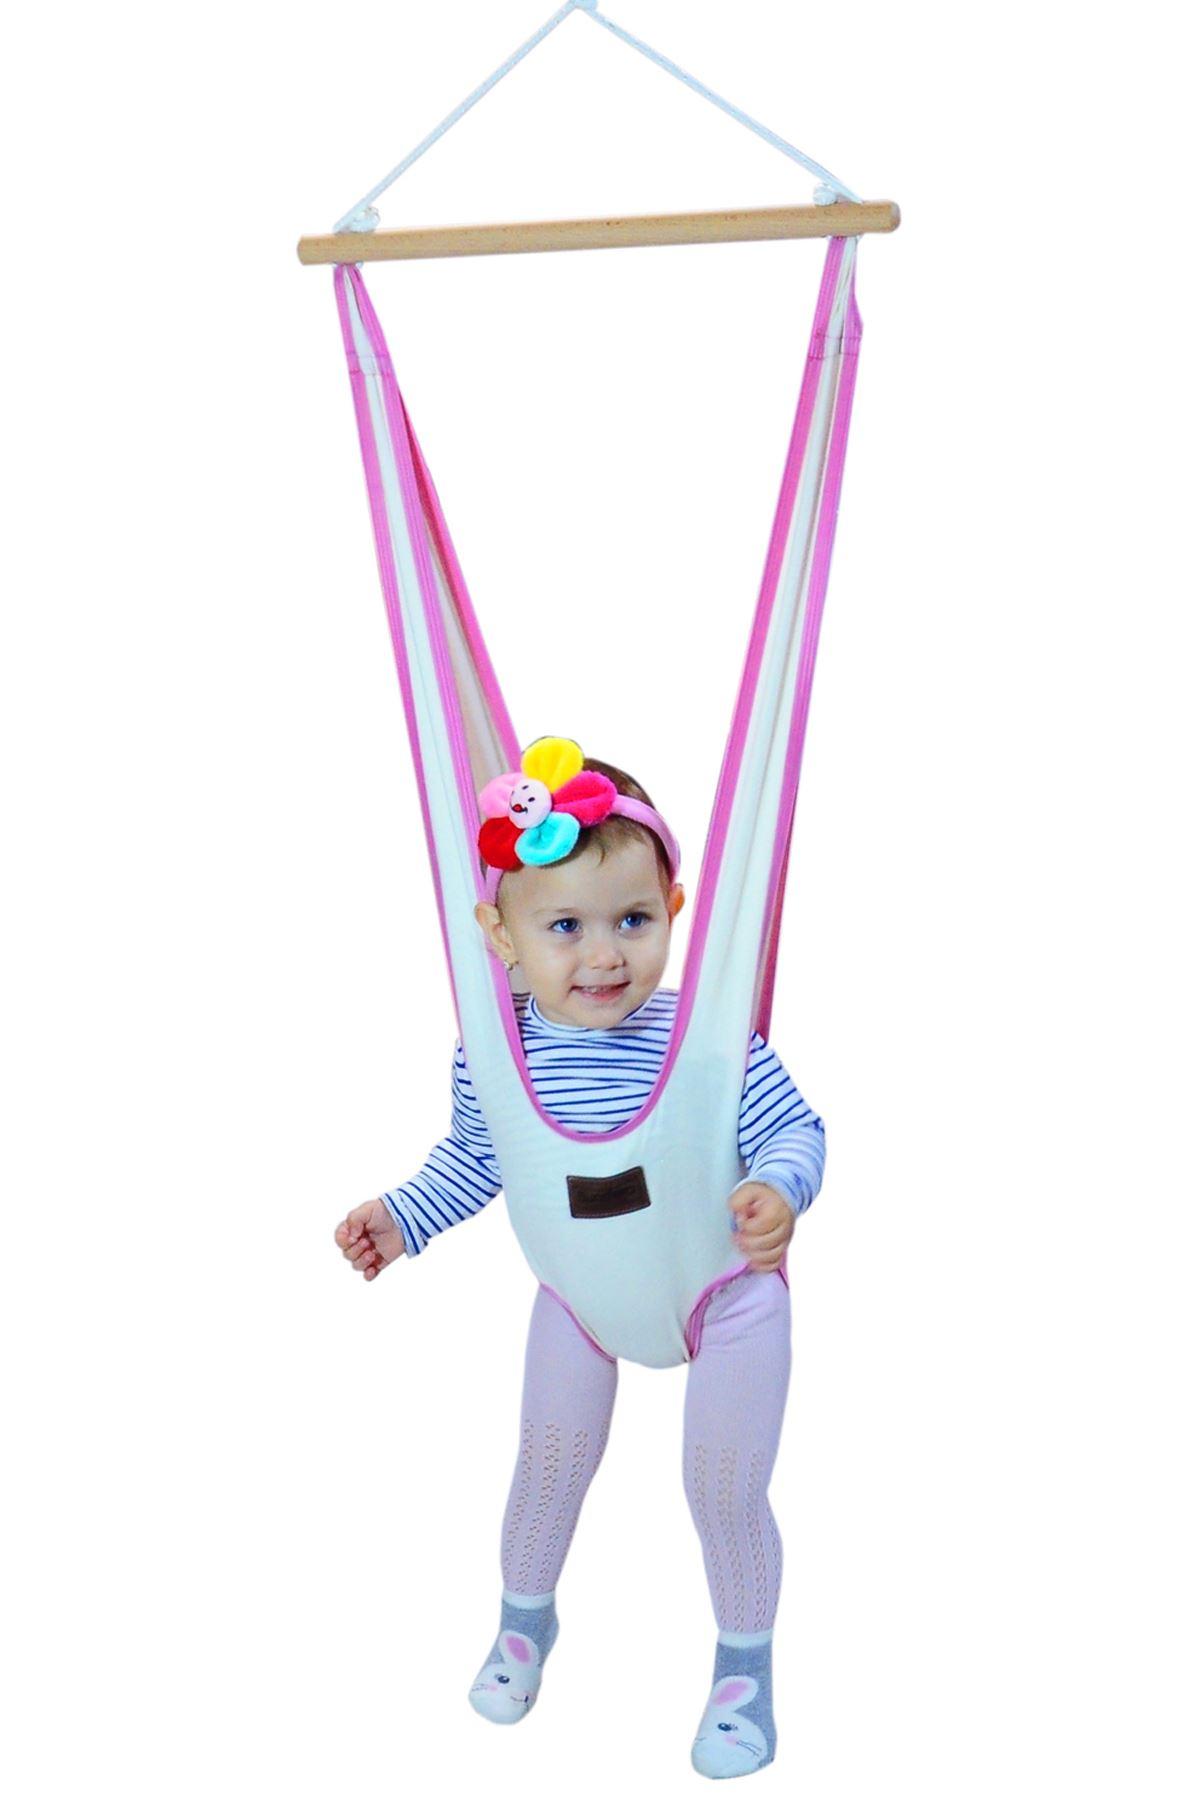 Bundera Luna Pink Baby Whoops Hoppy Walker